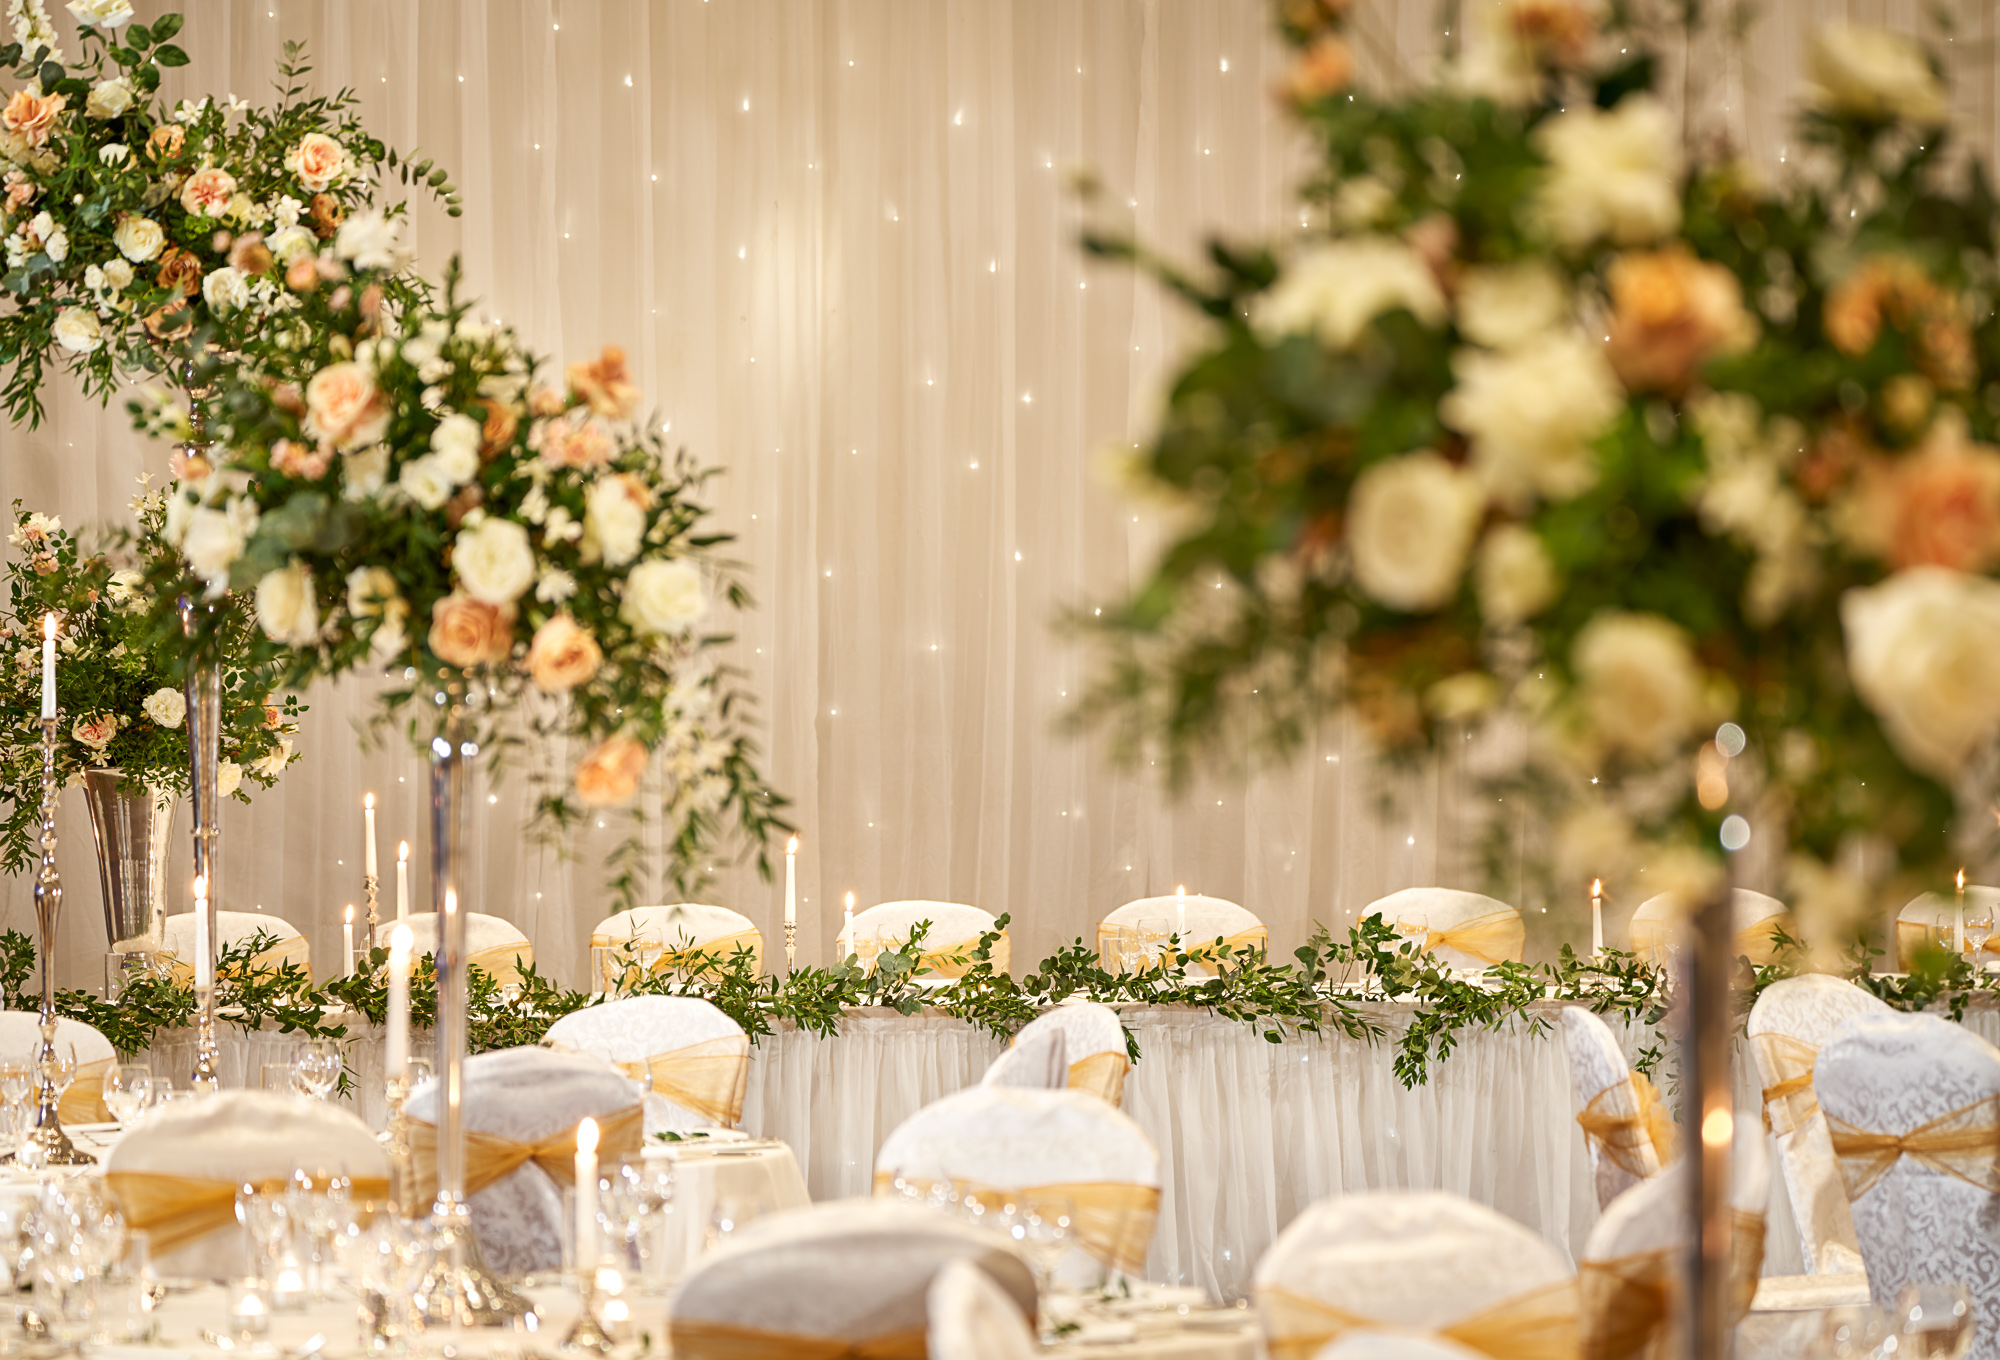 Galmont Wedding 10 2000px.jpg